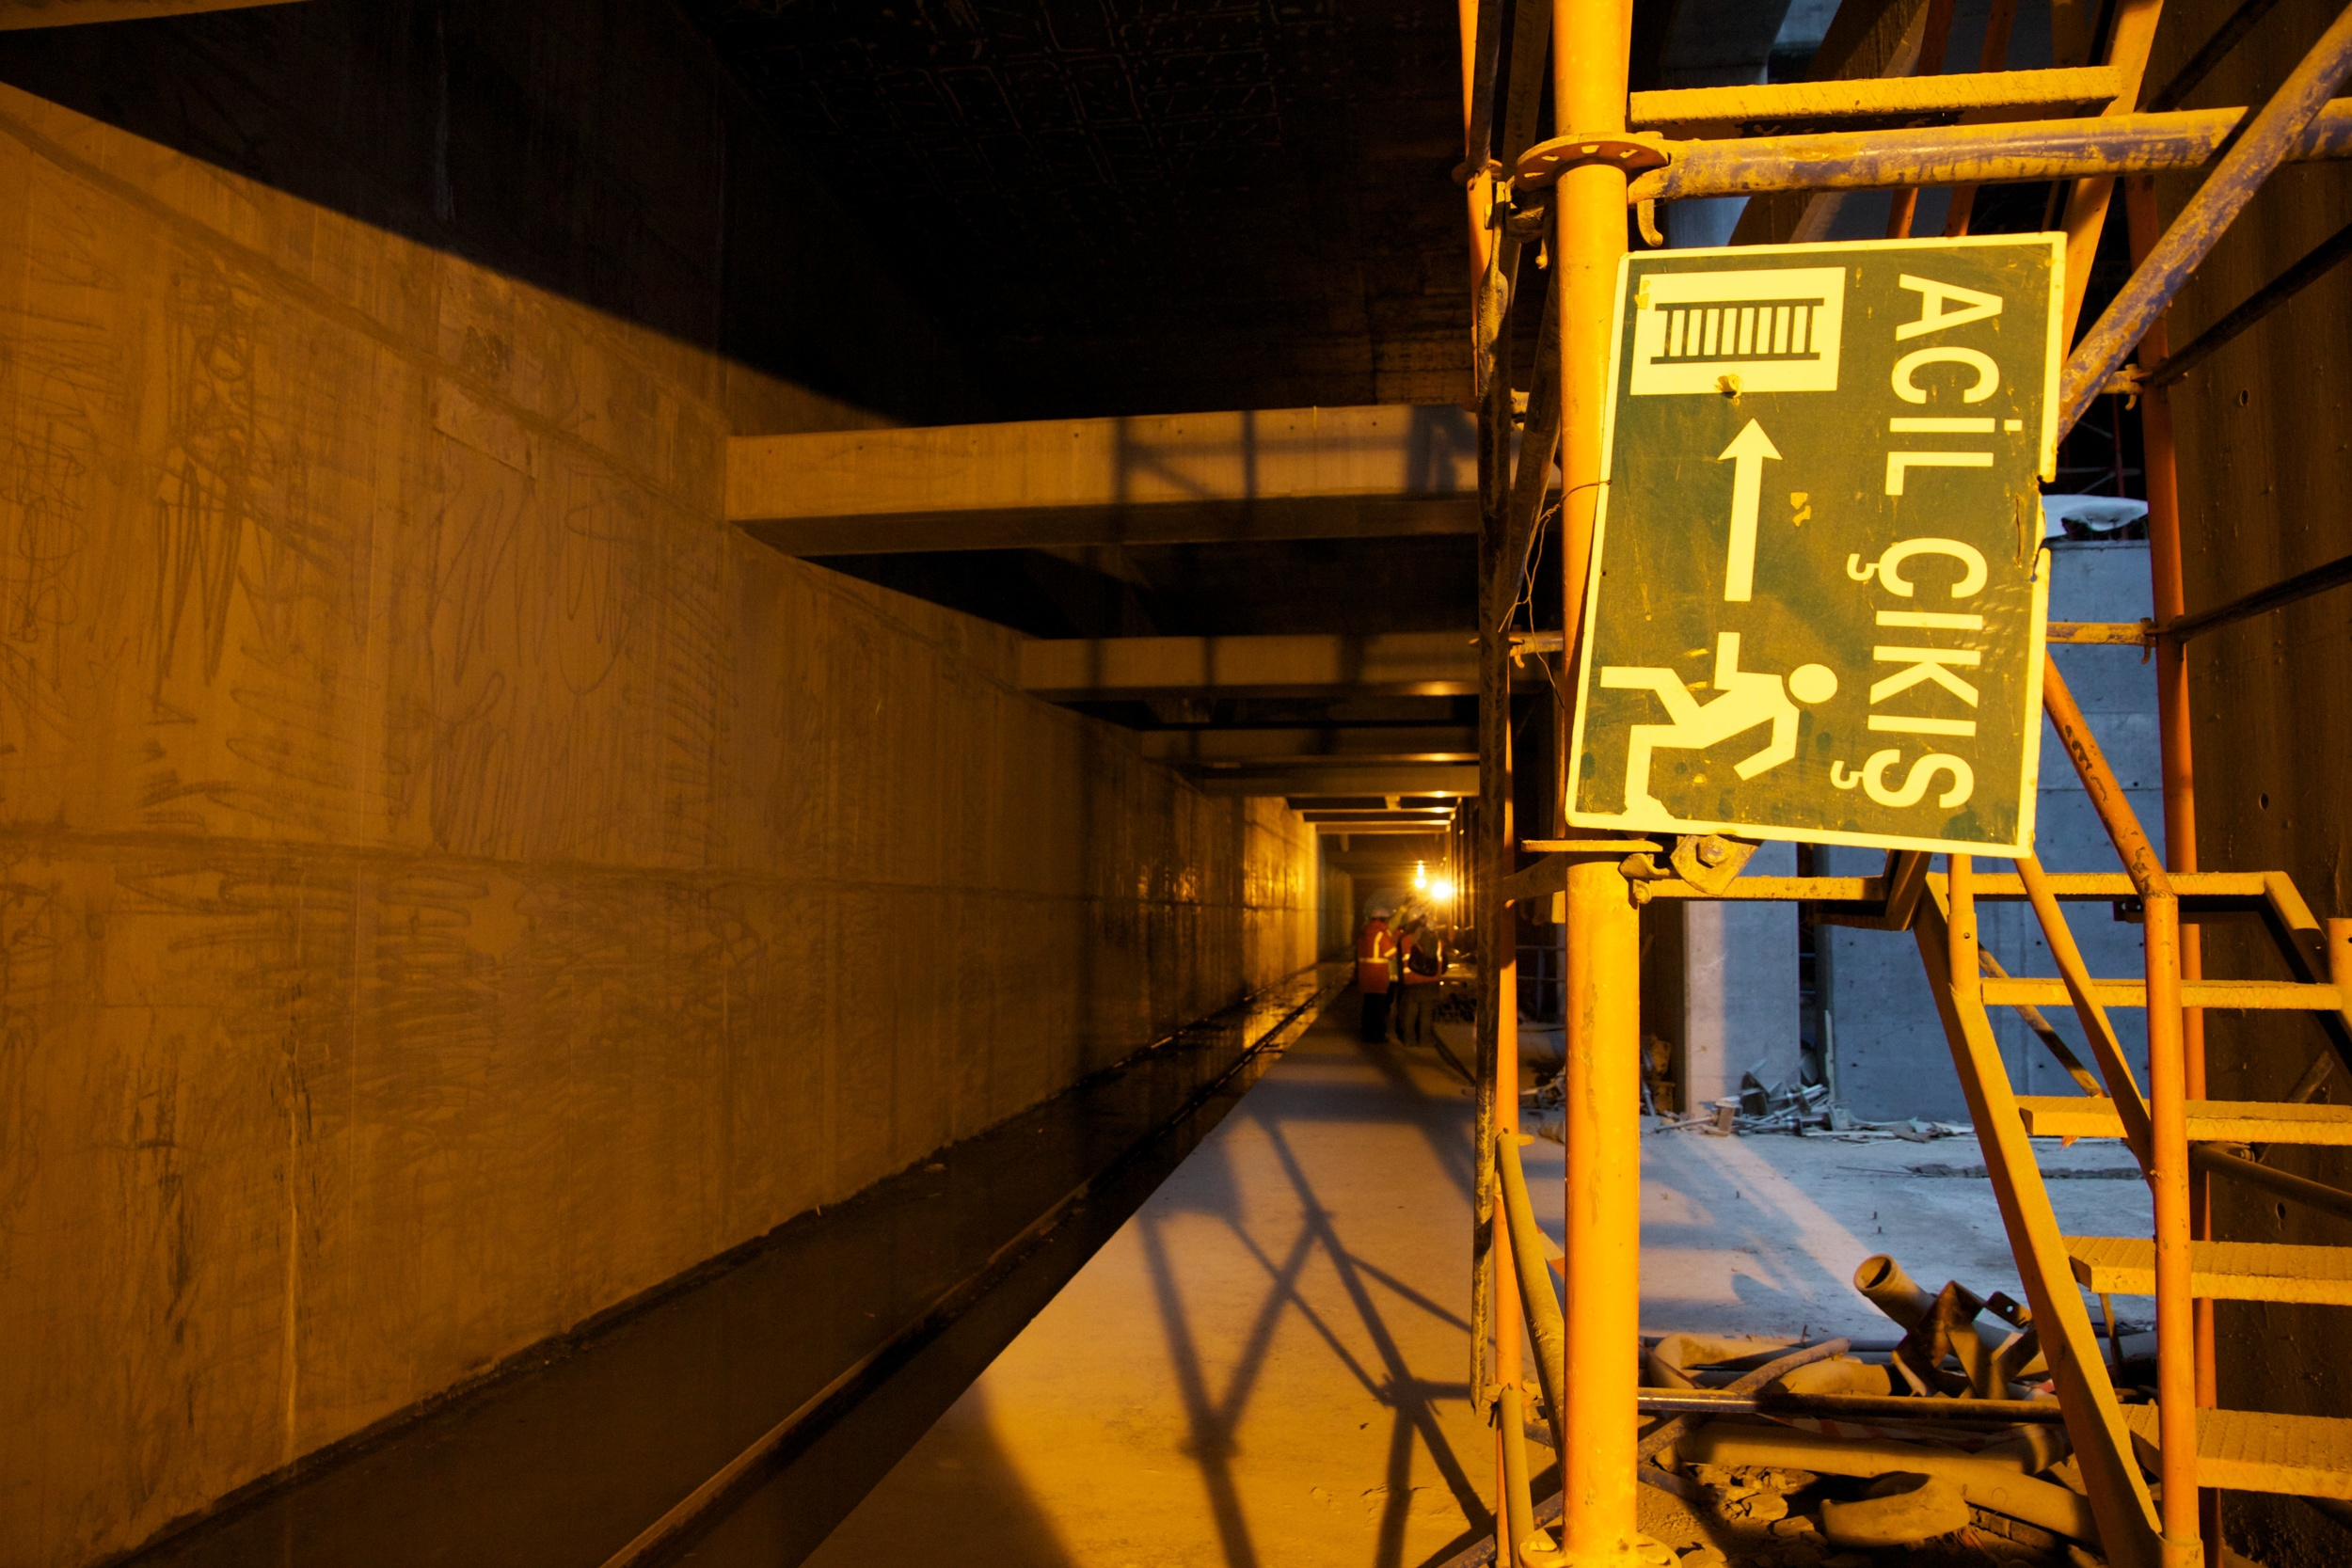 Sortie de secours - Construction de la ligne de métro Marmaray. Photo : Erinç Salor